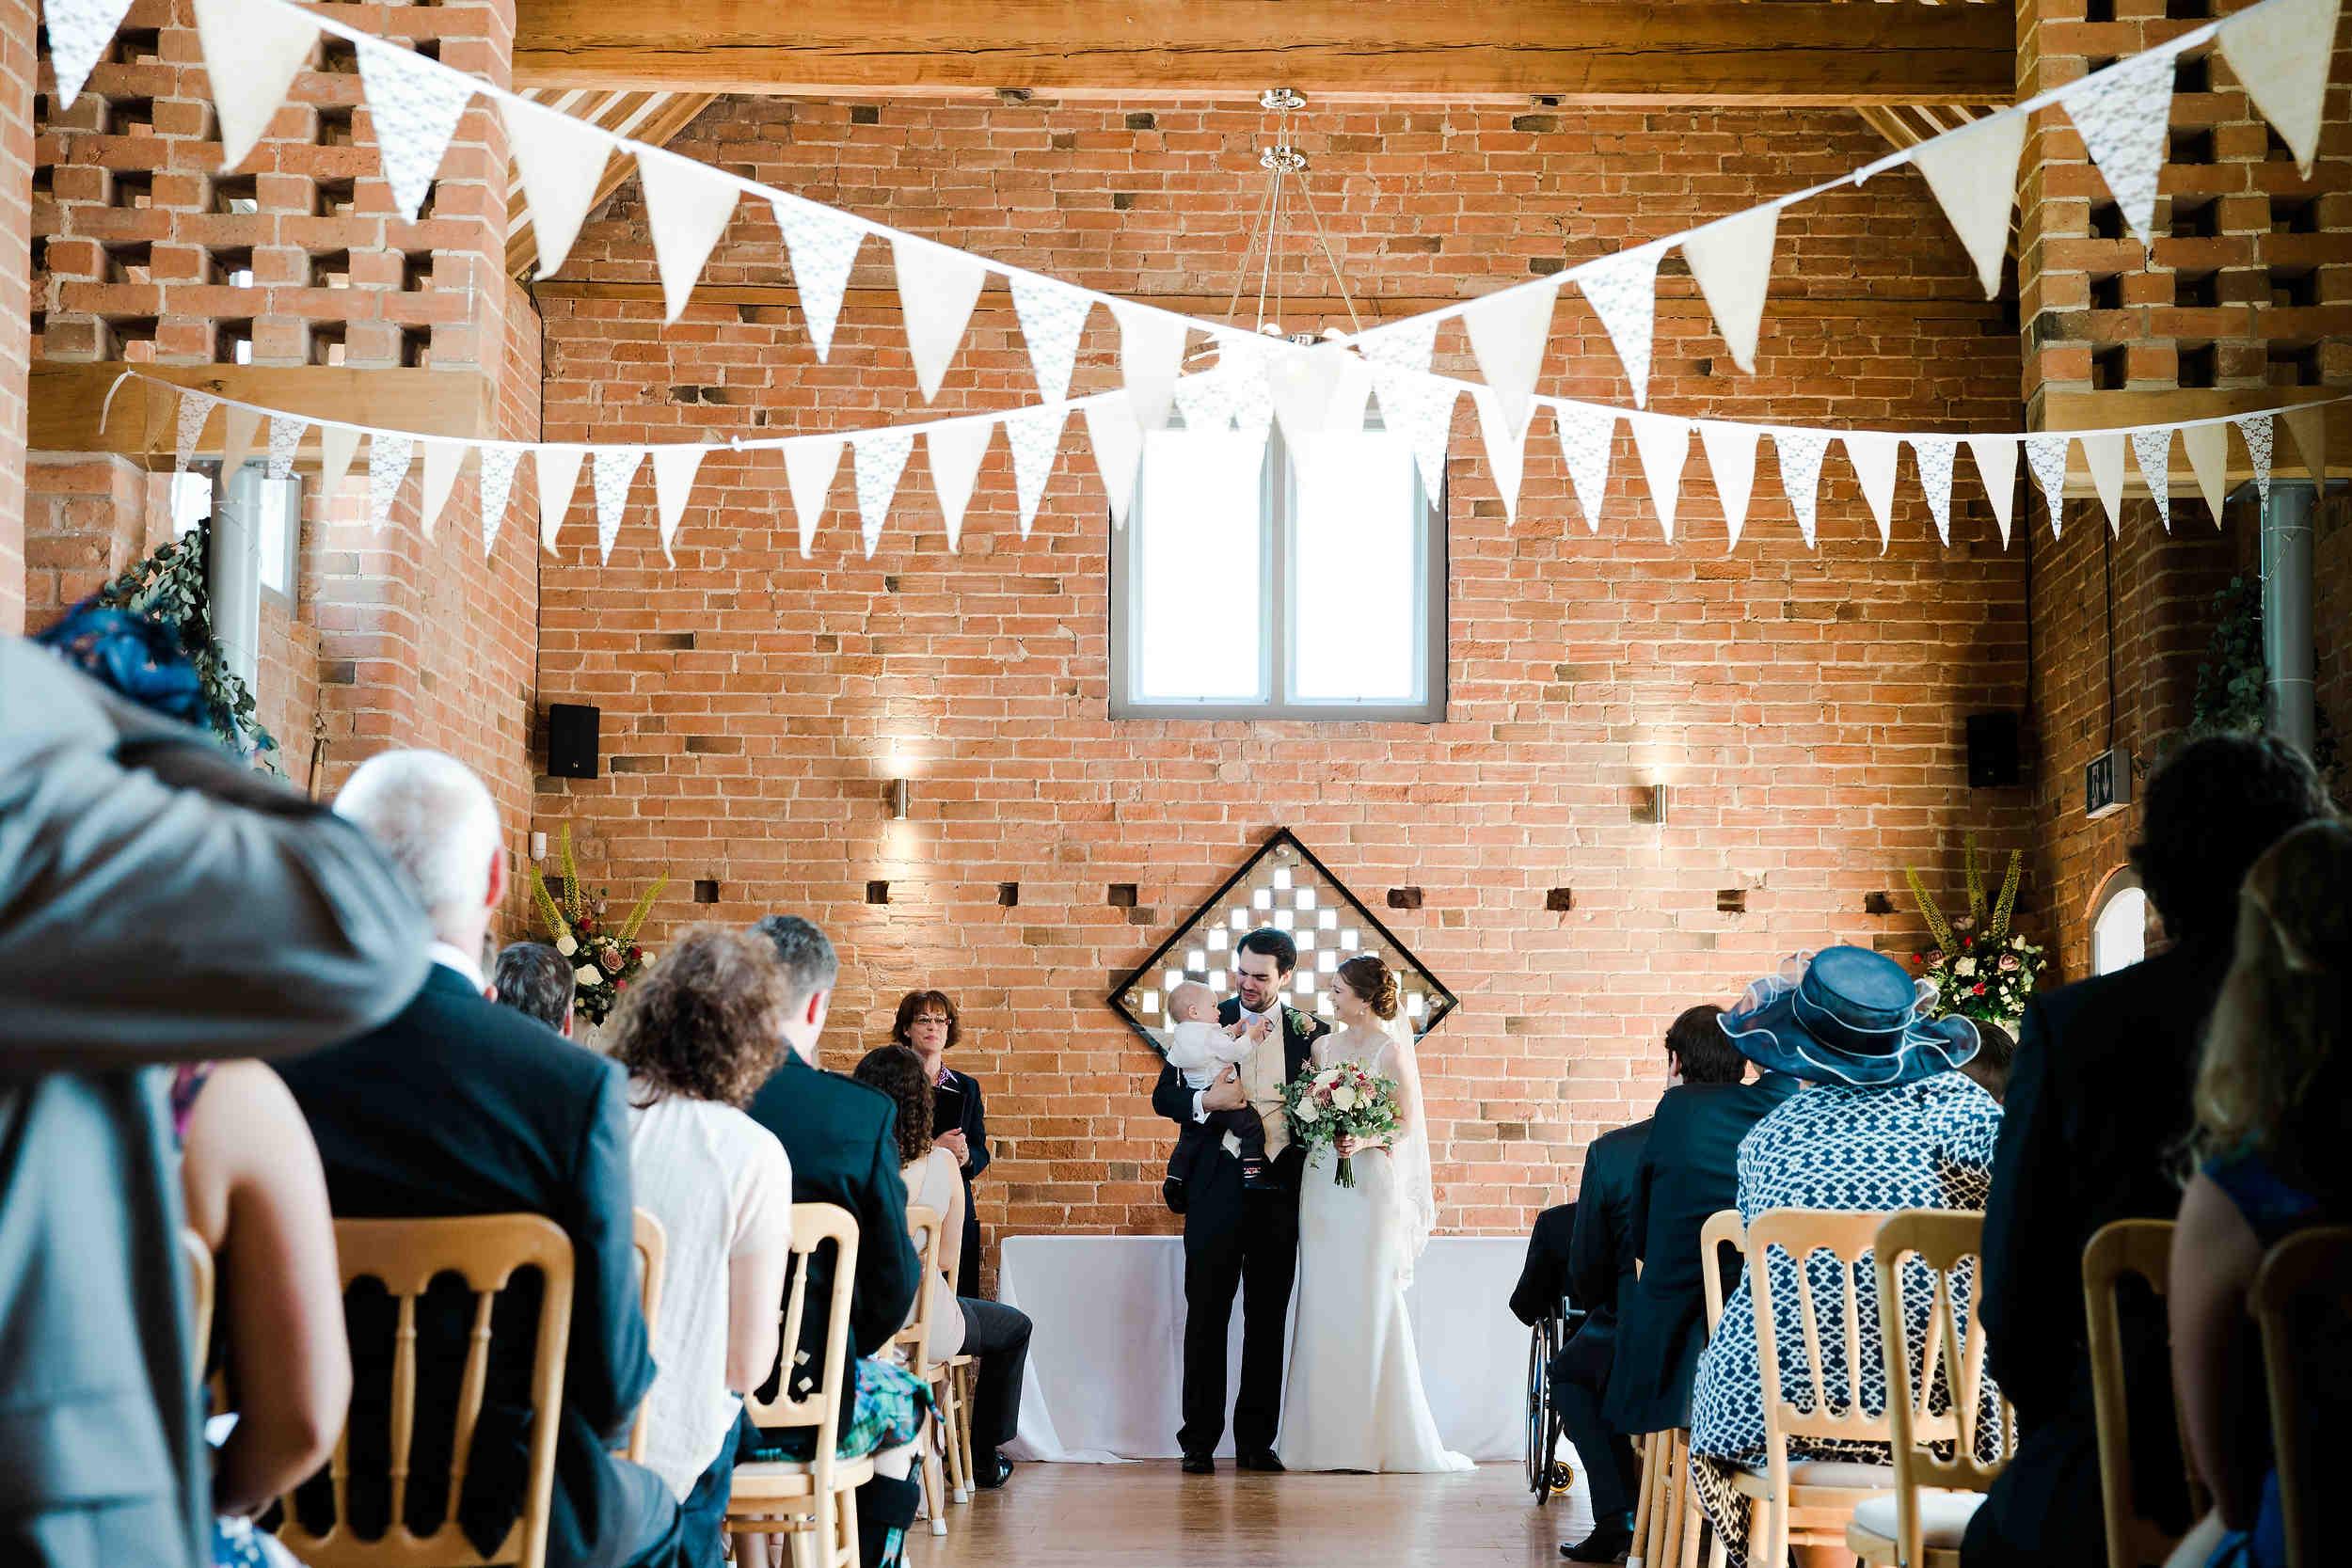 Modern_Stylish_Wedding_at_Swallows_Nest_Barn1184